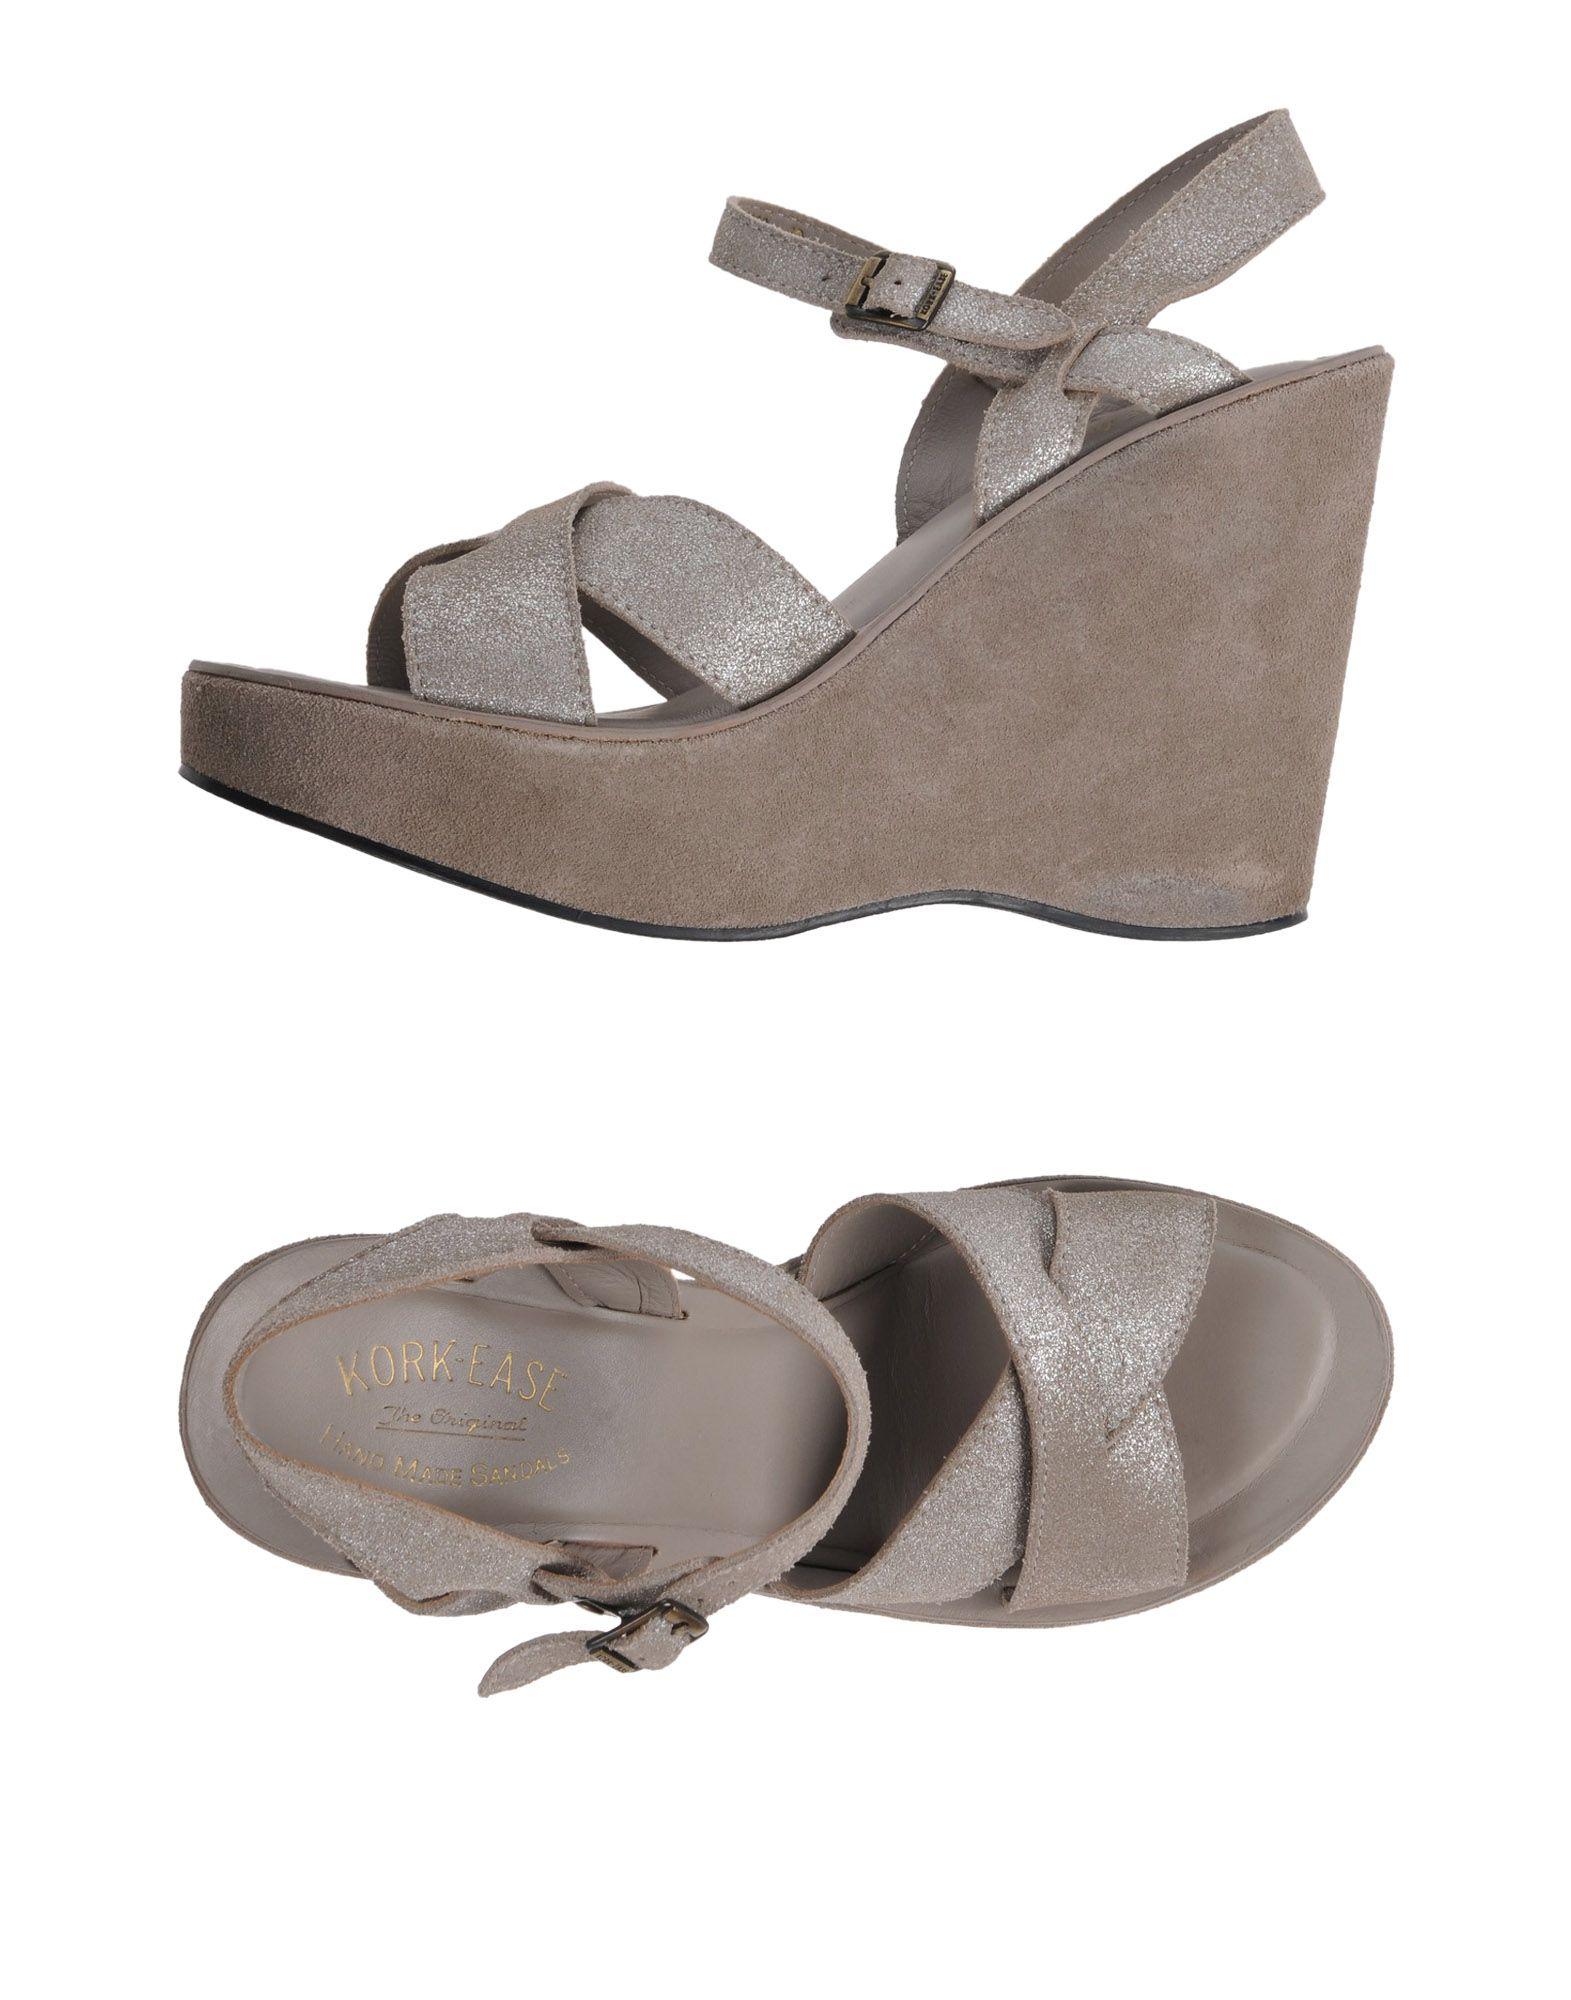 KORK-EASE Sandals in Grey